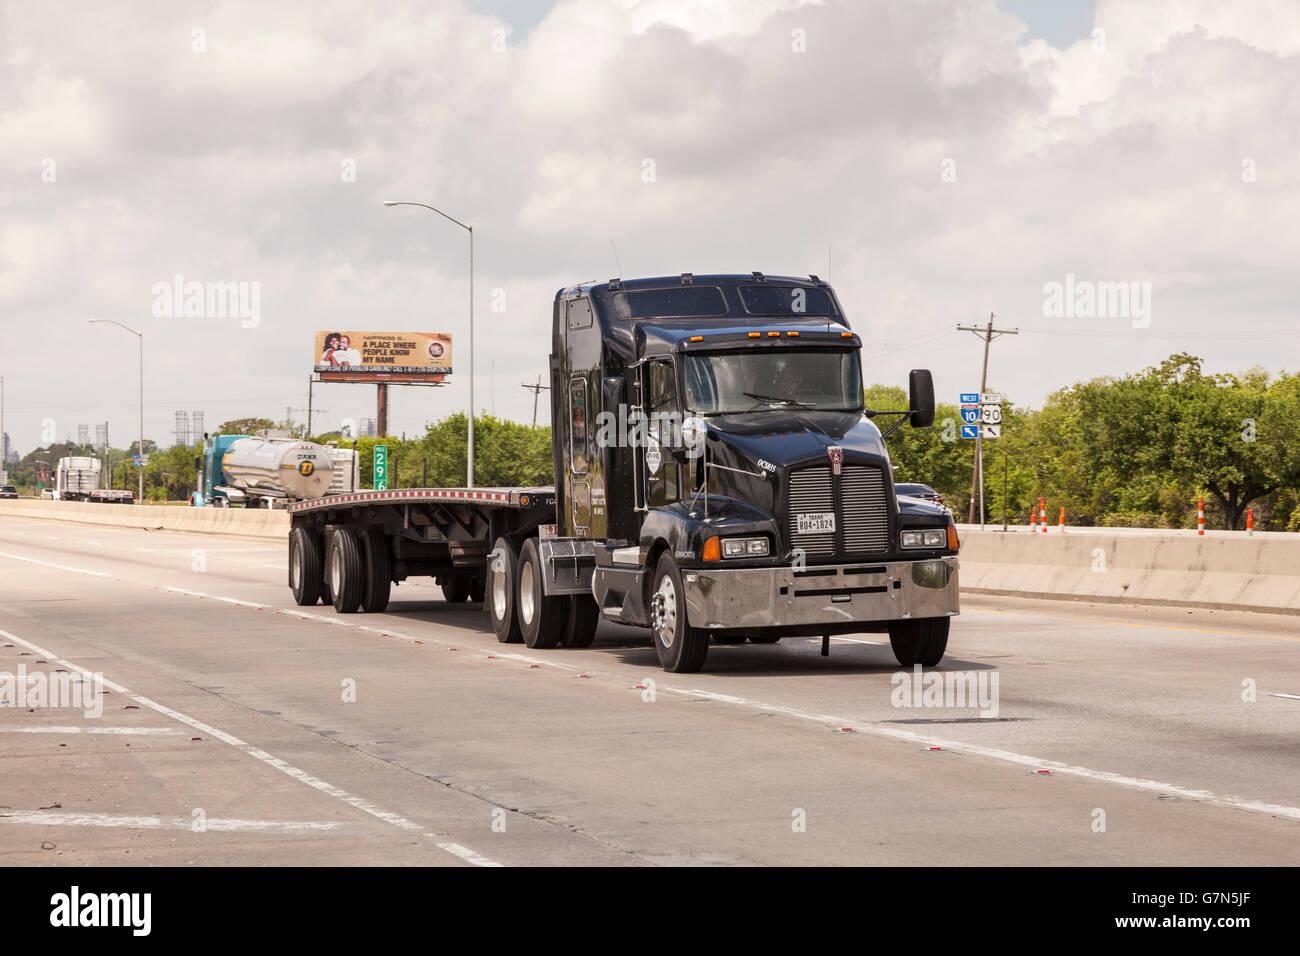 Black Kenworth Truck on the highway - Stock Image